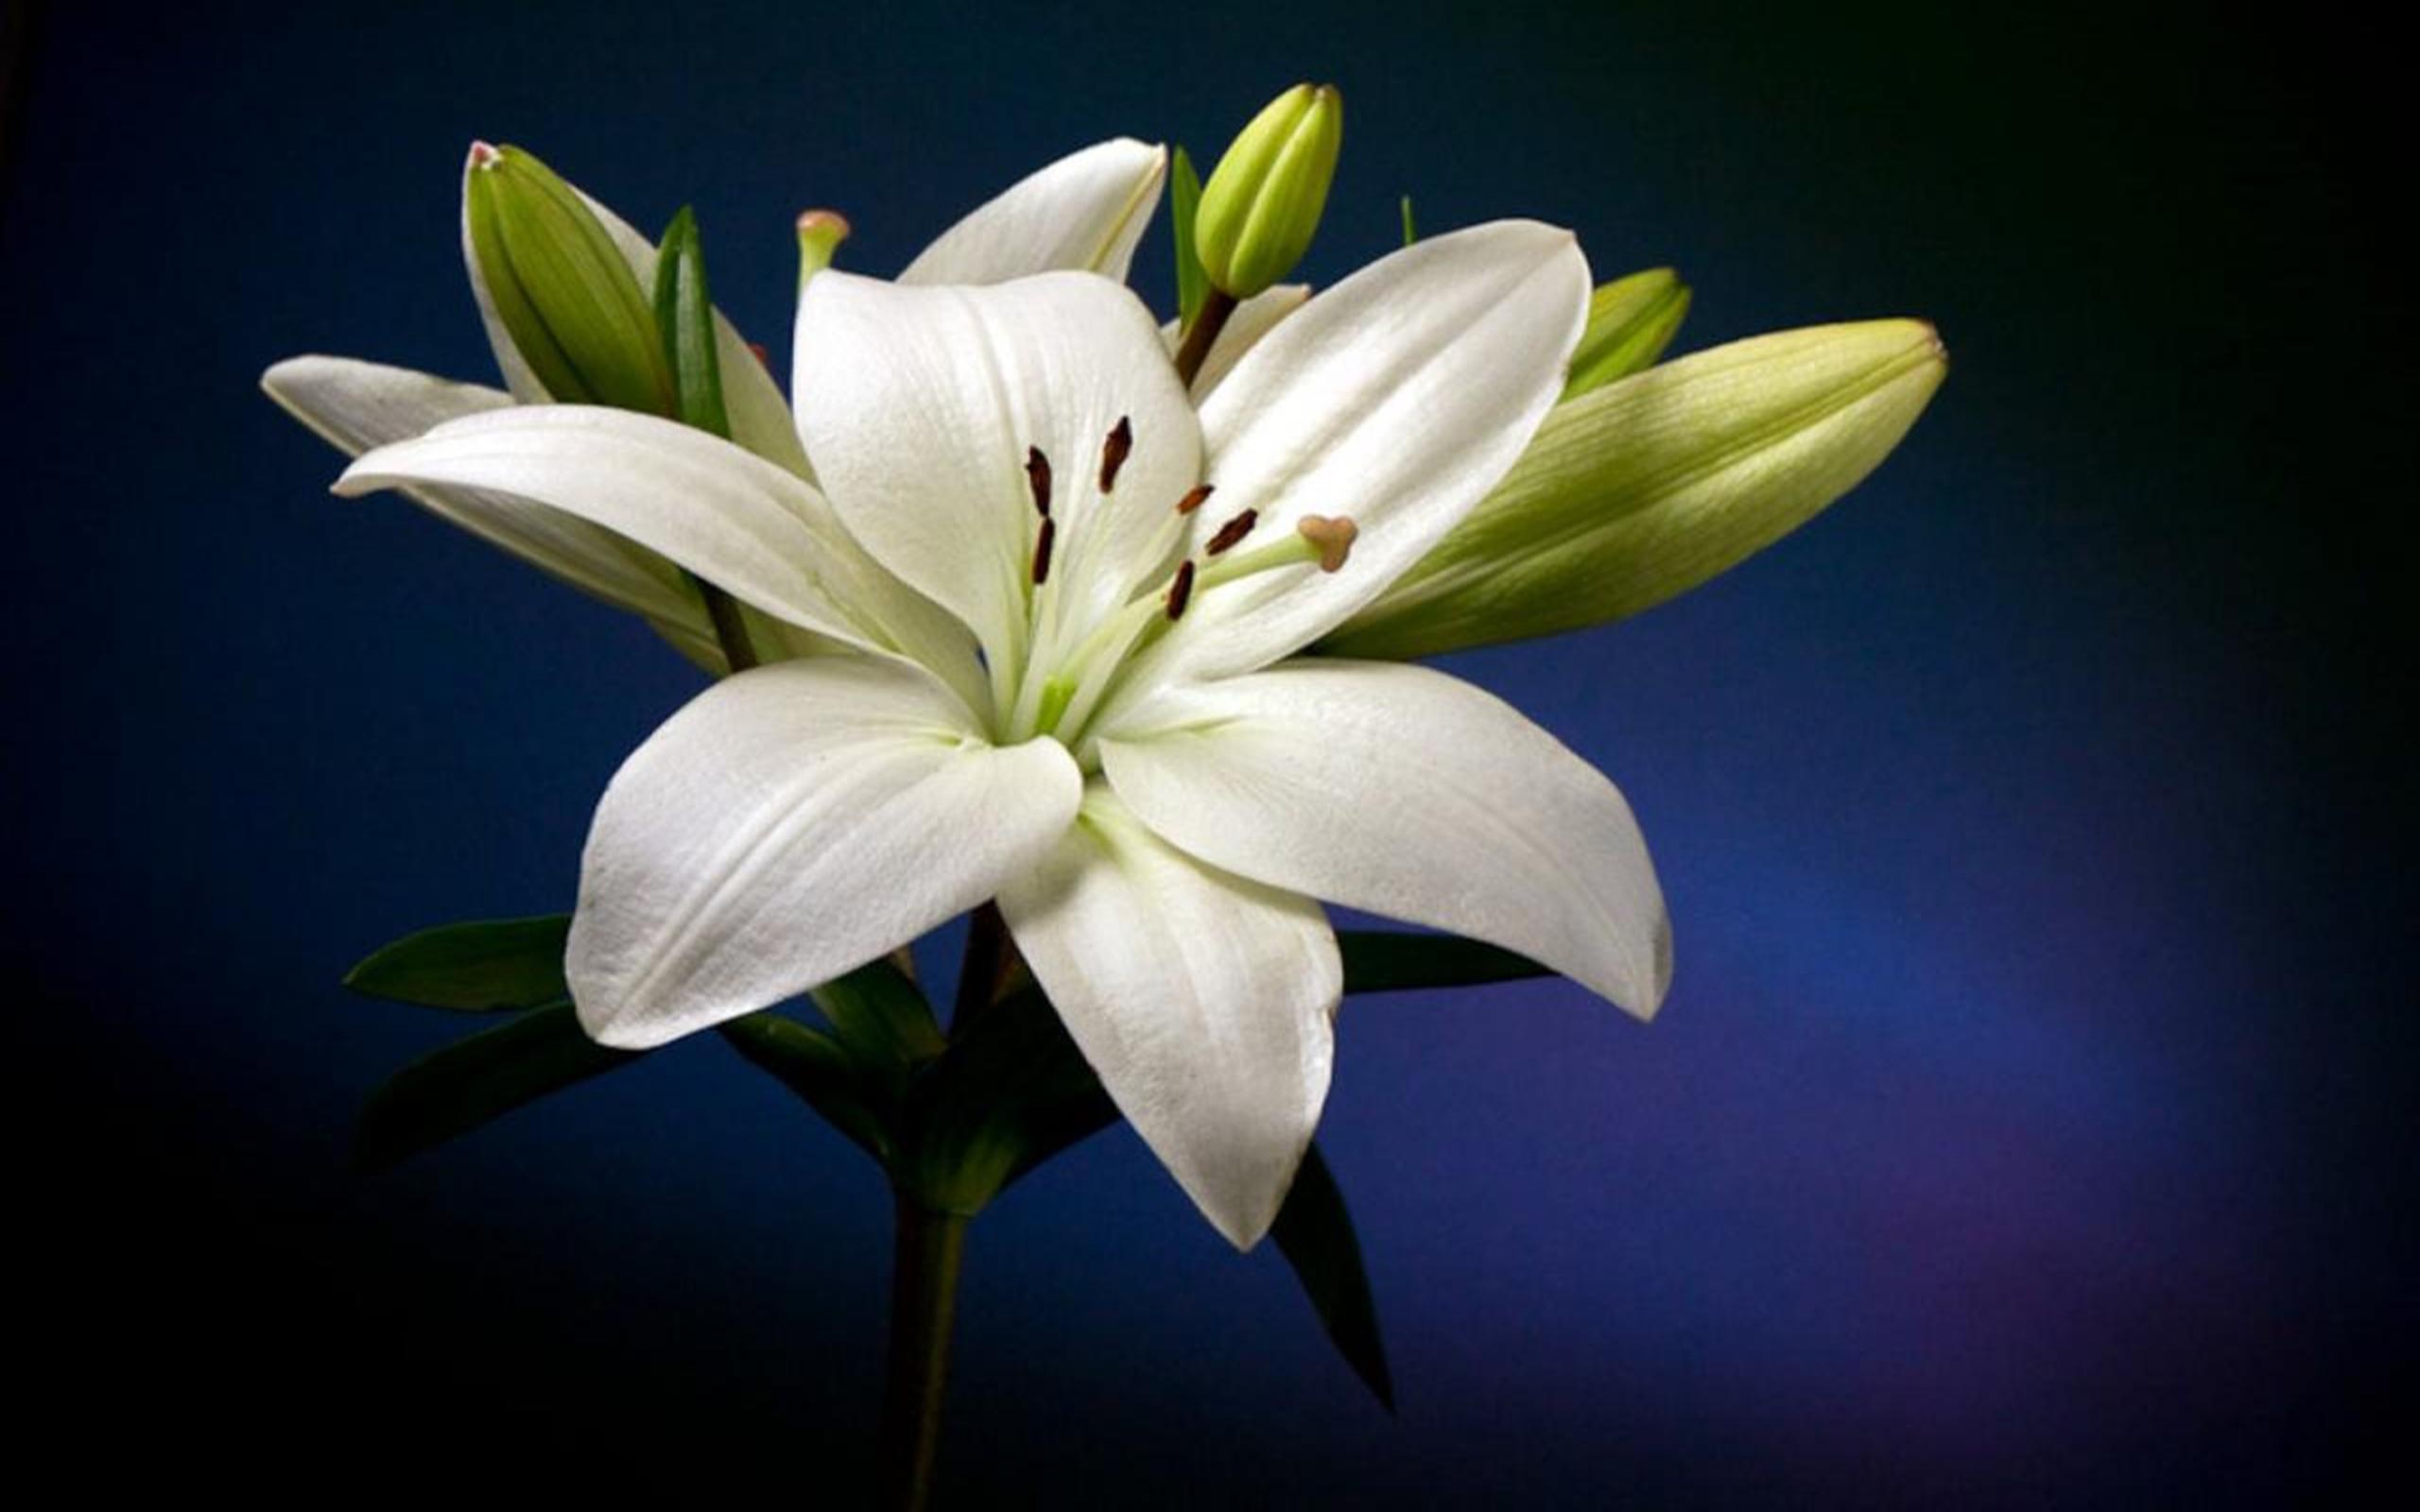 Rose Flower Wallpaper Hd Free Download Beautiful White Lily Flower Hd Wallpaper Wallpapers13 Com